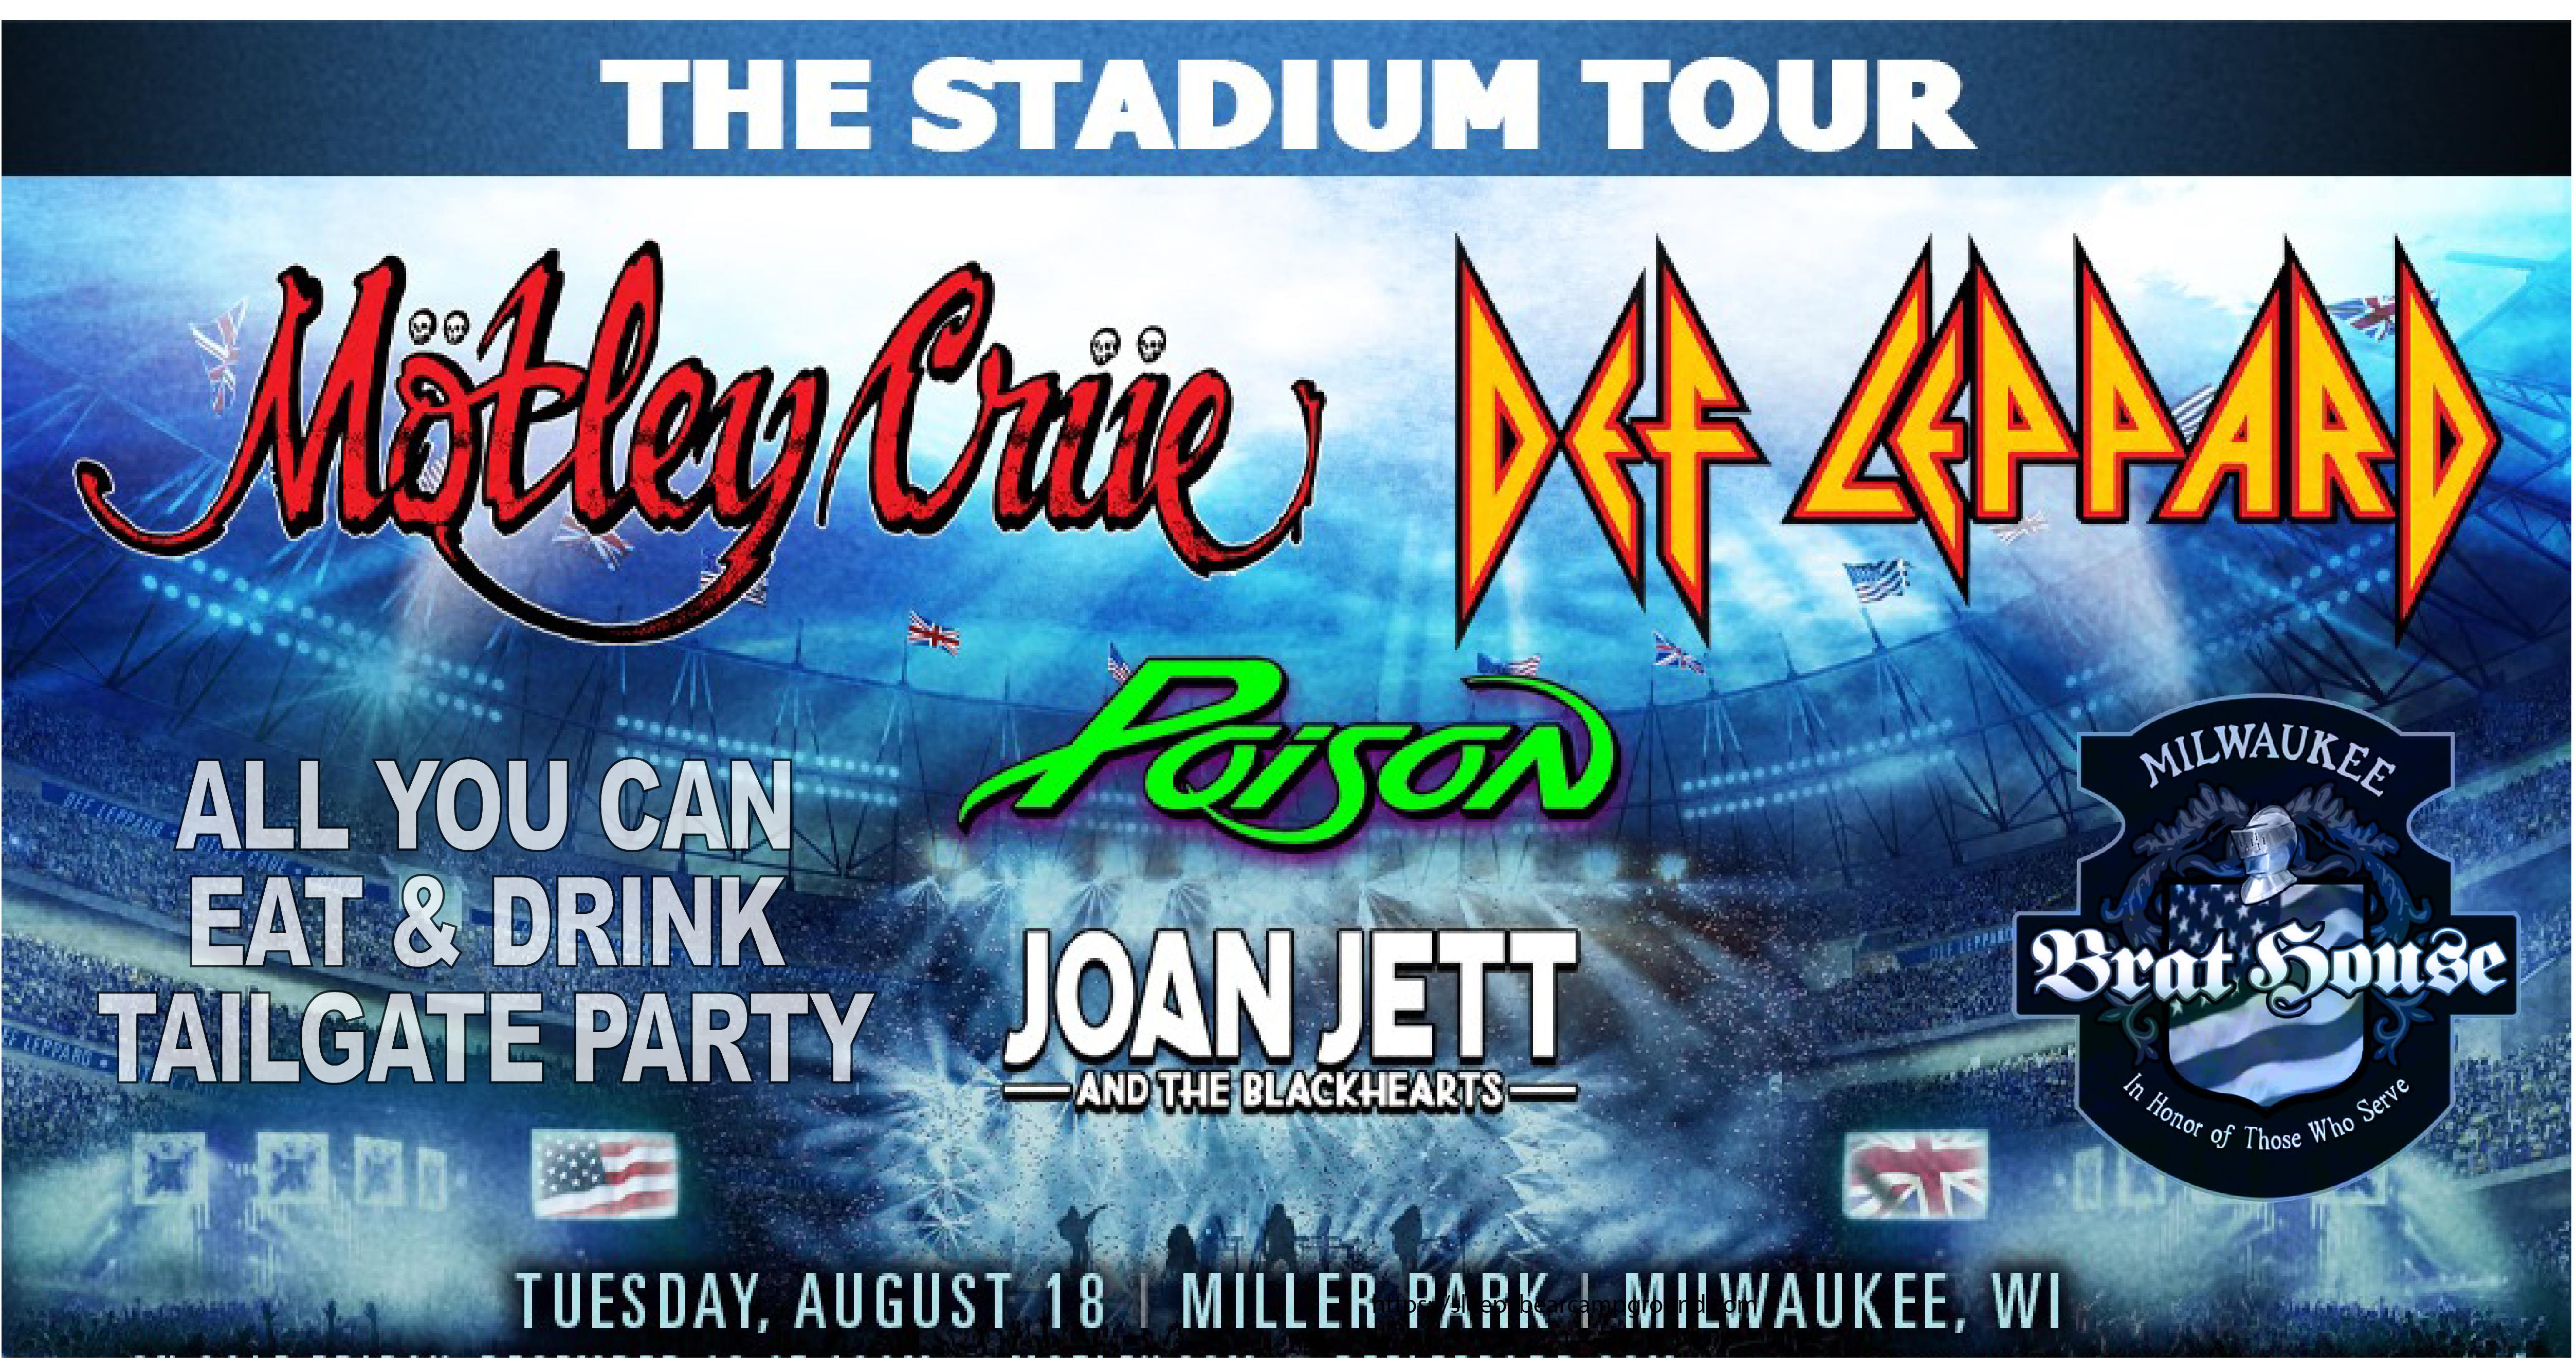 Motley Crue - Def Leppard - Poison - Joan Jett  | All u Can Eat & Drink Tailgate - Miller Park